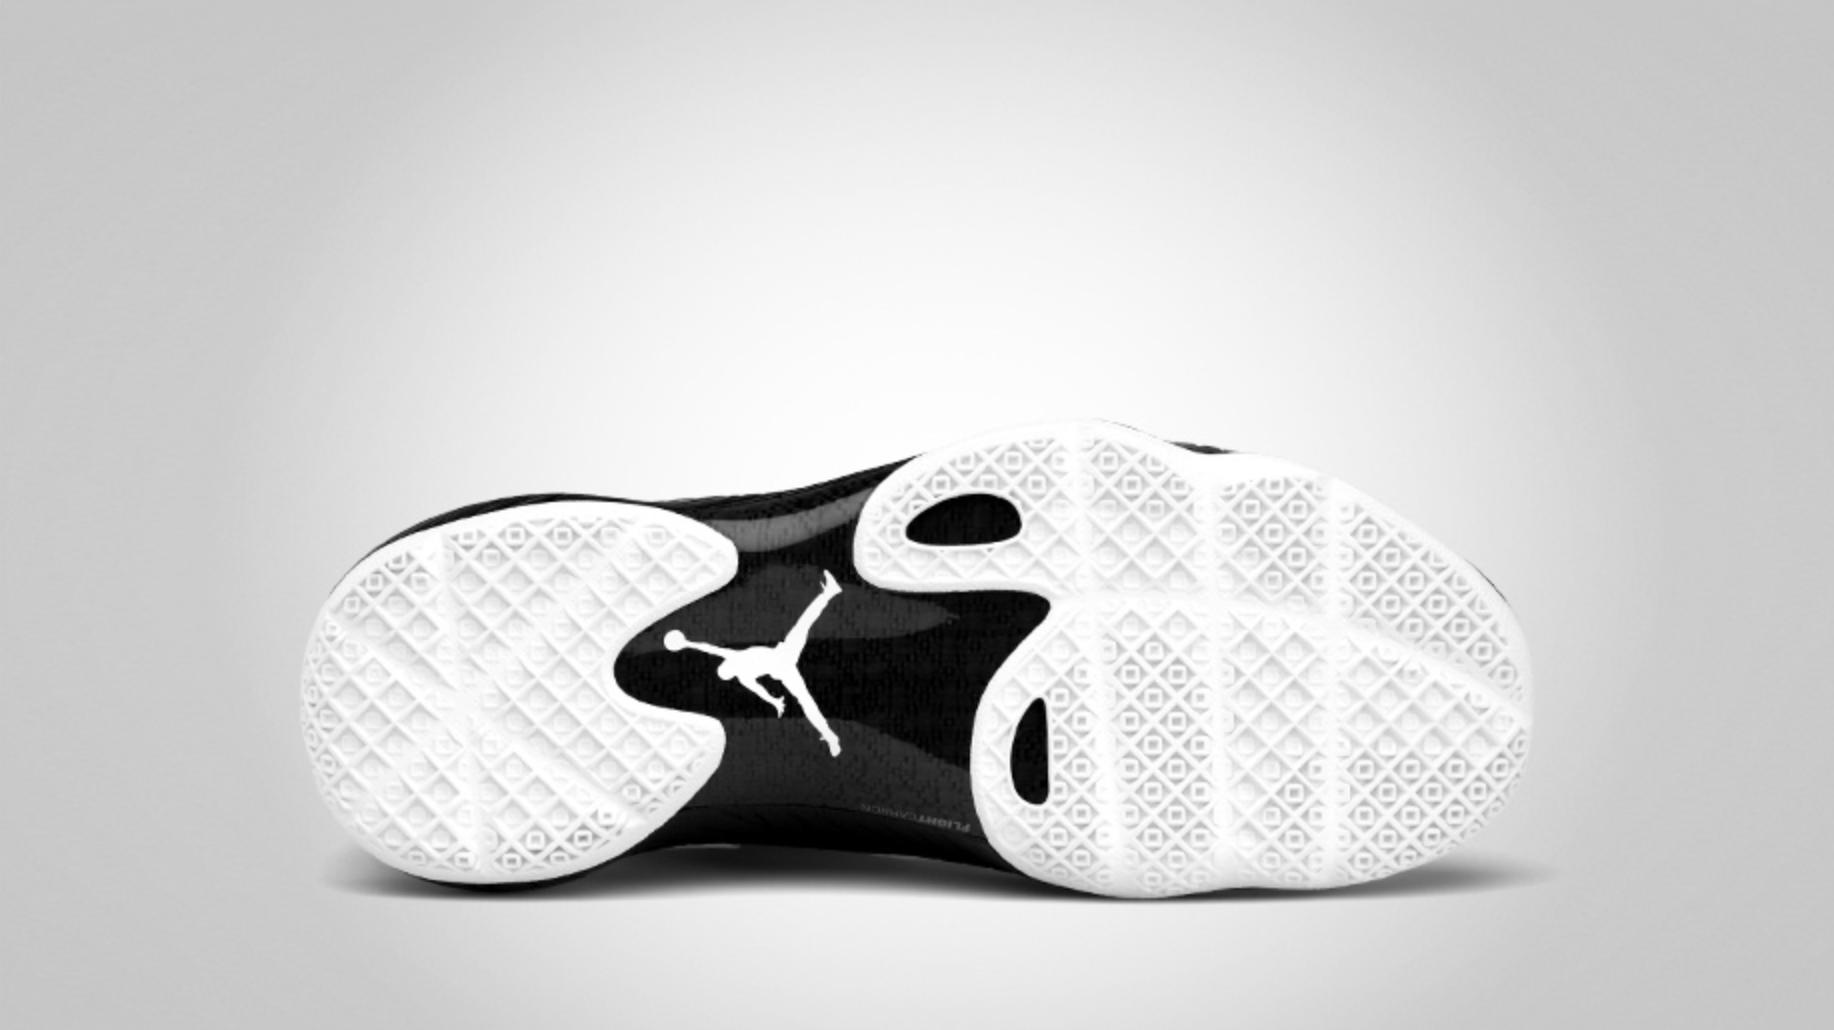 Air Jordan 2012 Lite 'White/Gym Red-Black' - Official Images